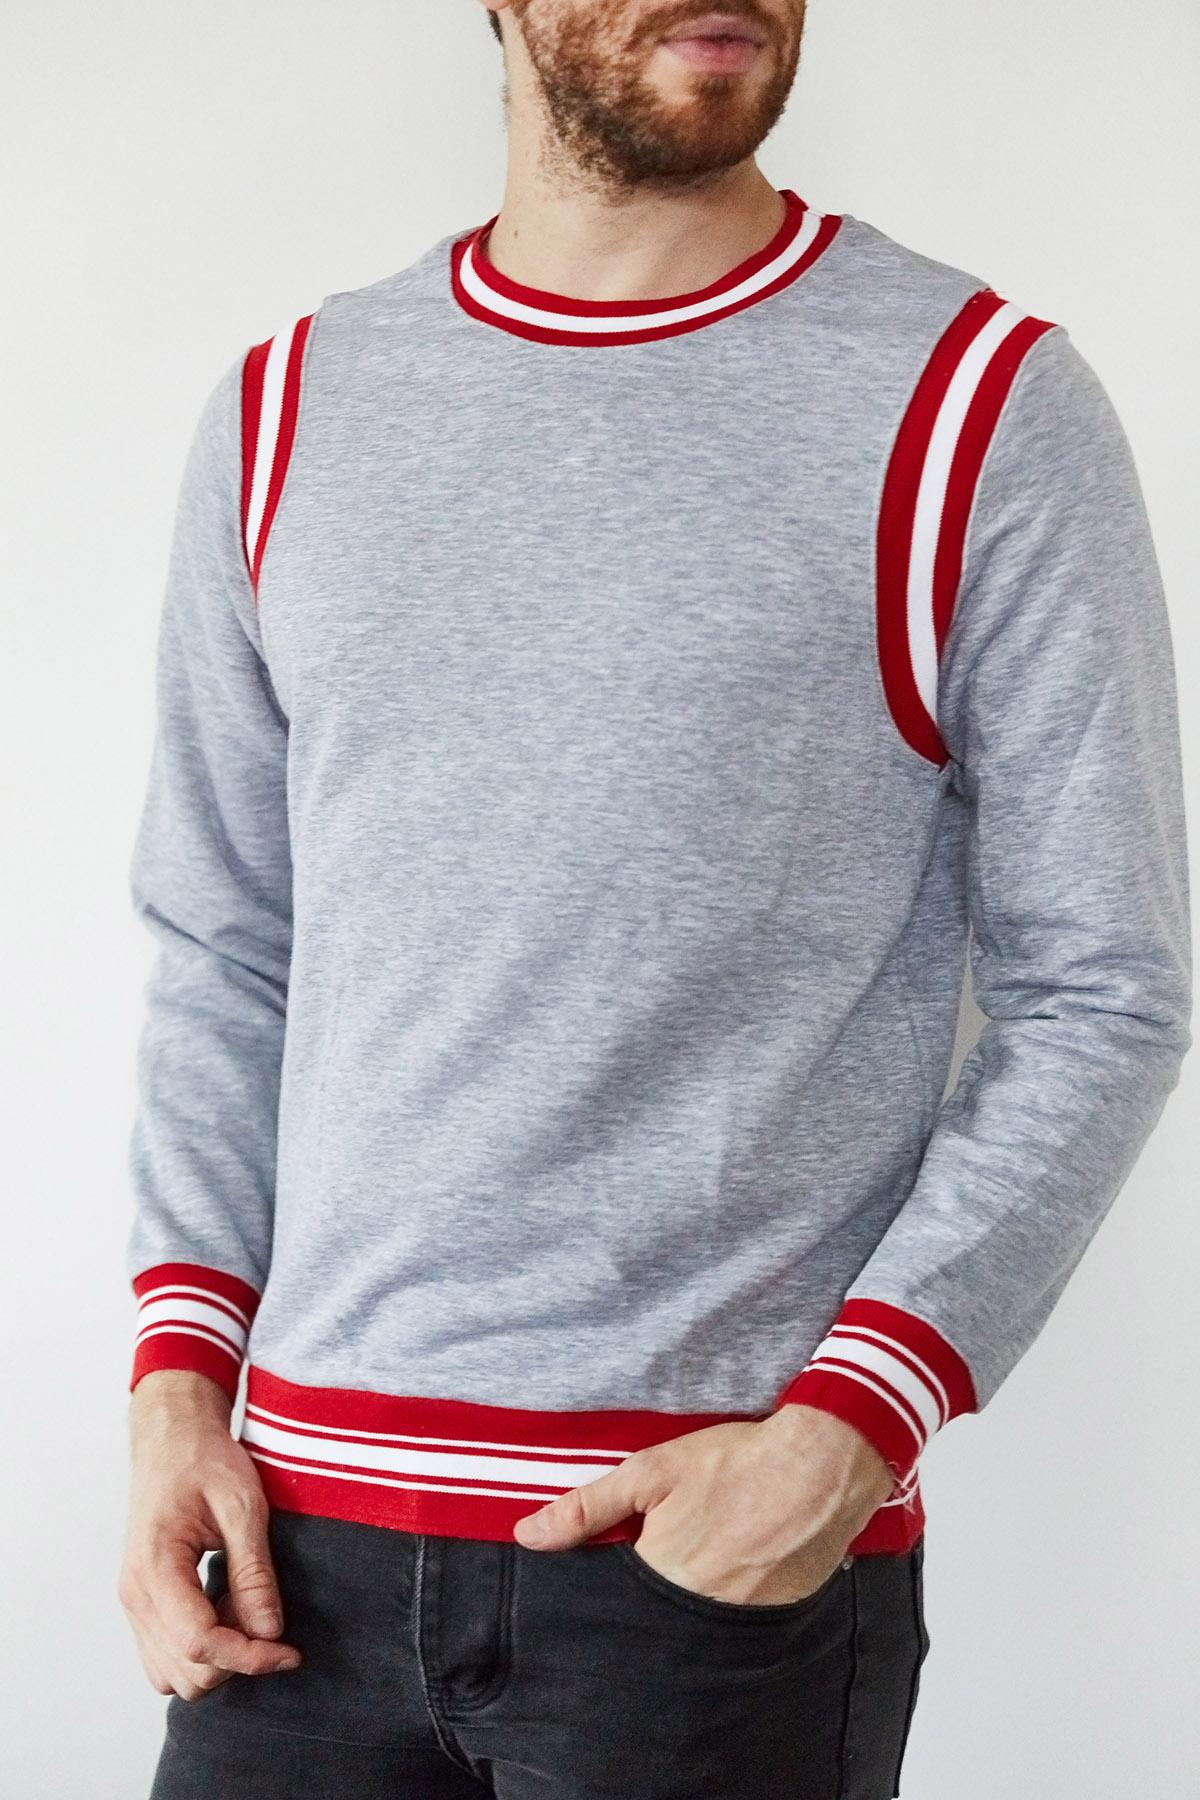 - Gri & Kırmızı Şeritli Bisiklet Yaka Sweatshirt 1KXE8-44164-03